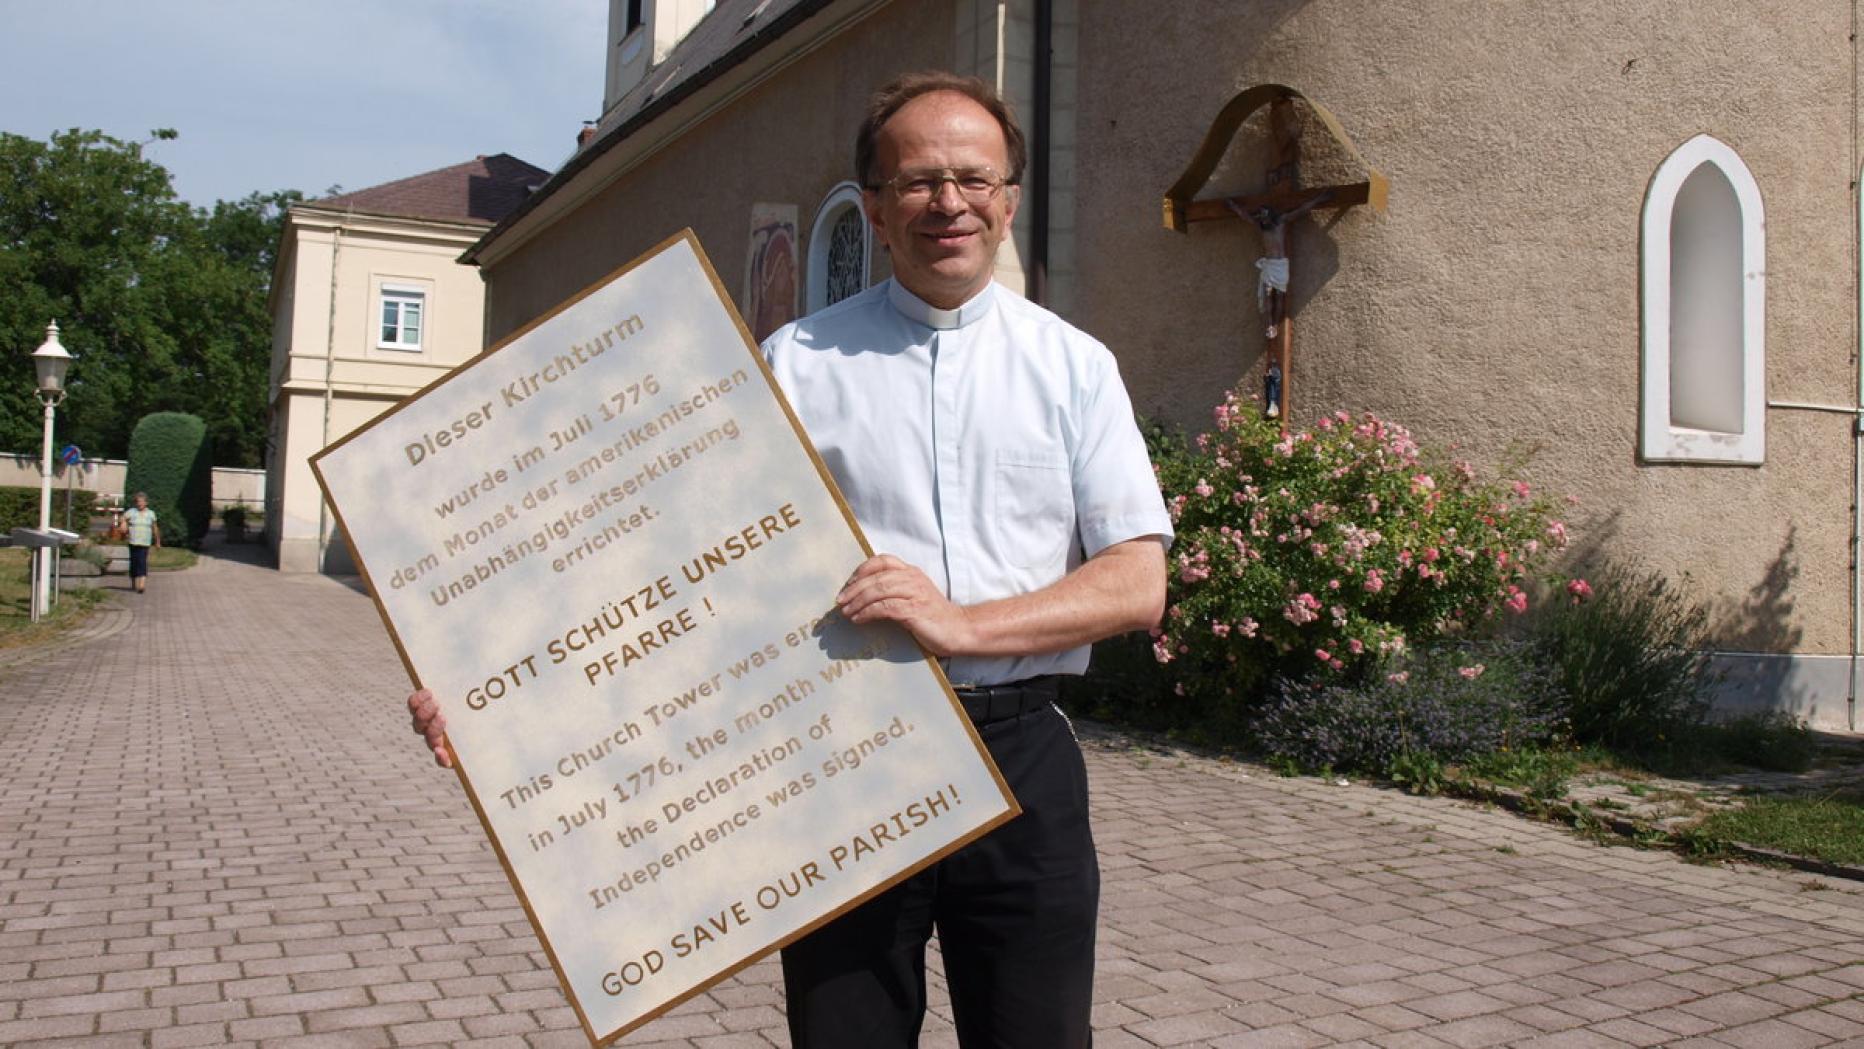 Single mann in bad mitterndorf Oberwaltersdorf singlebrse kostenlos